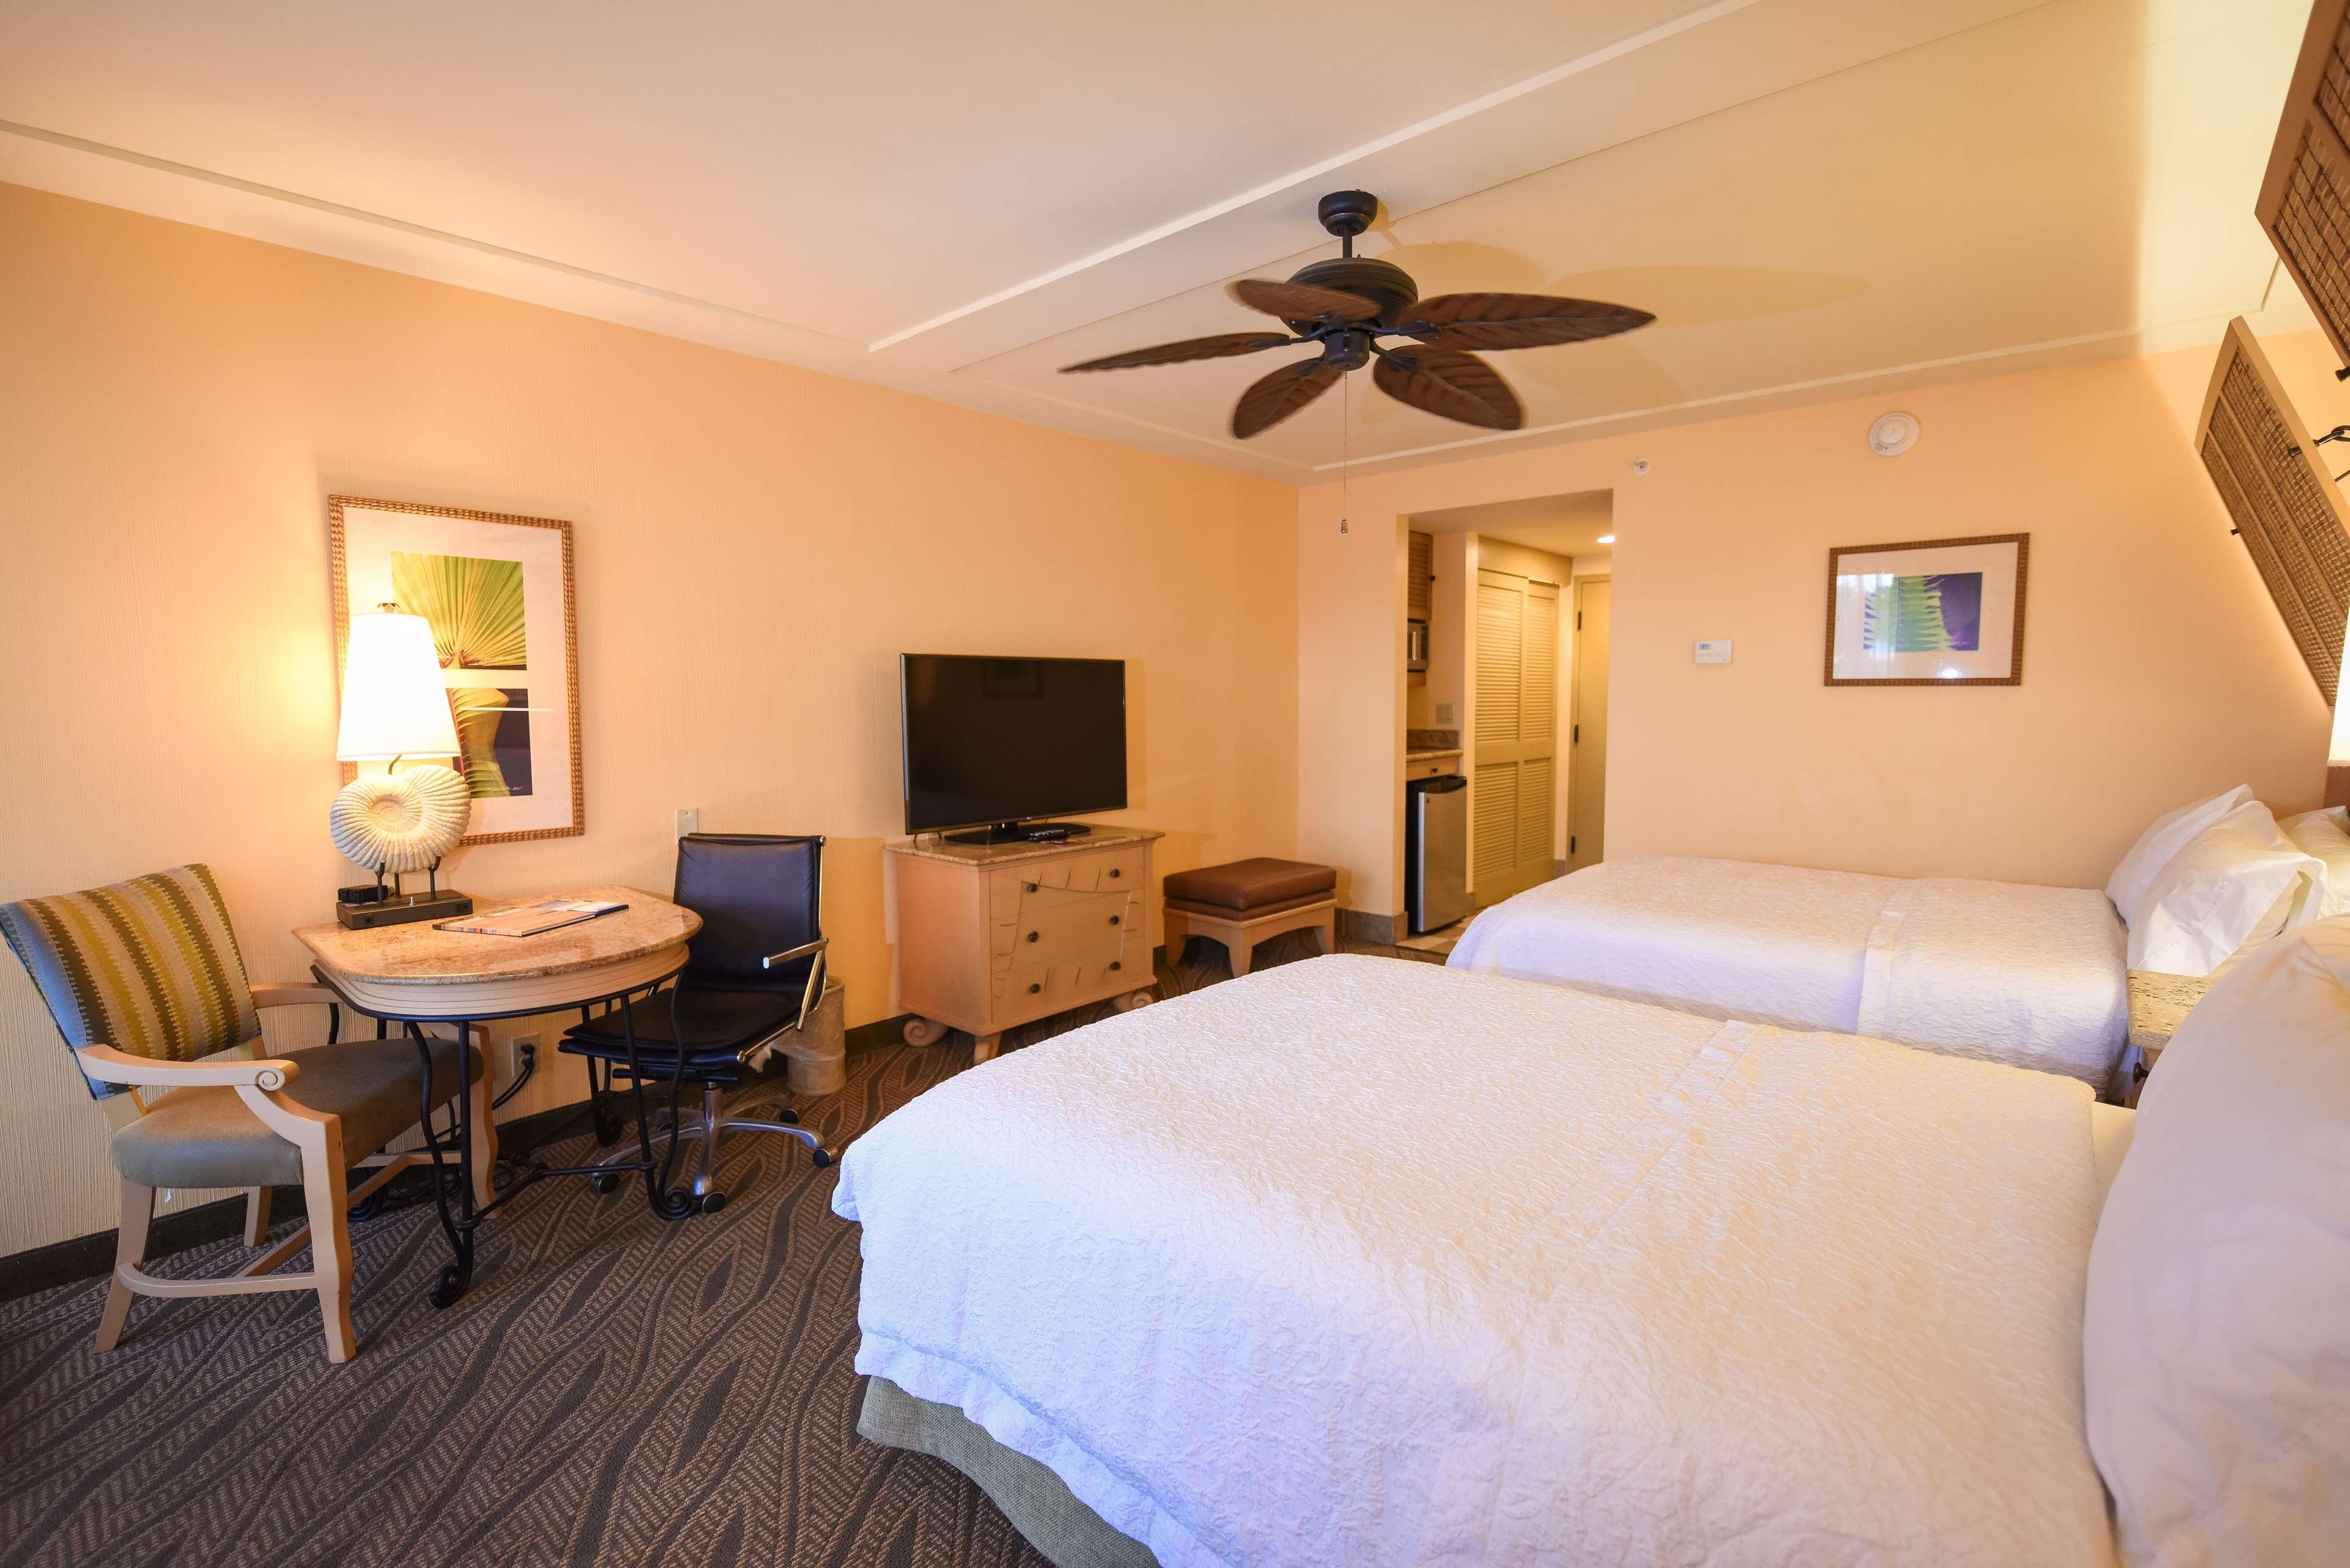 Hampton Inn Key Largo, FL image 24